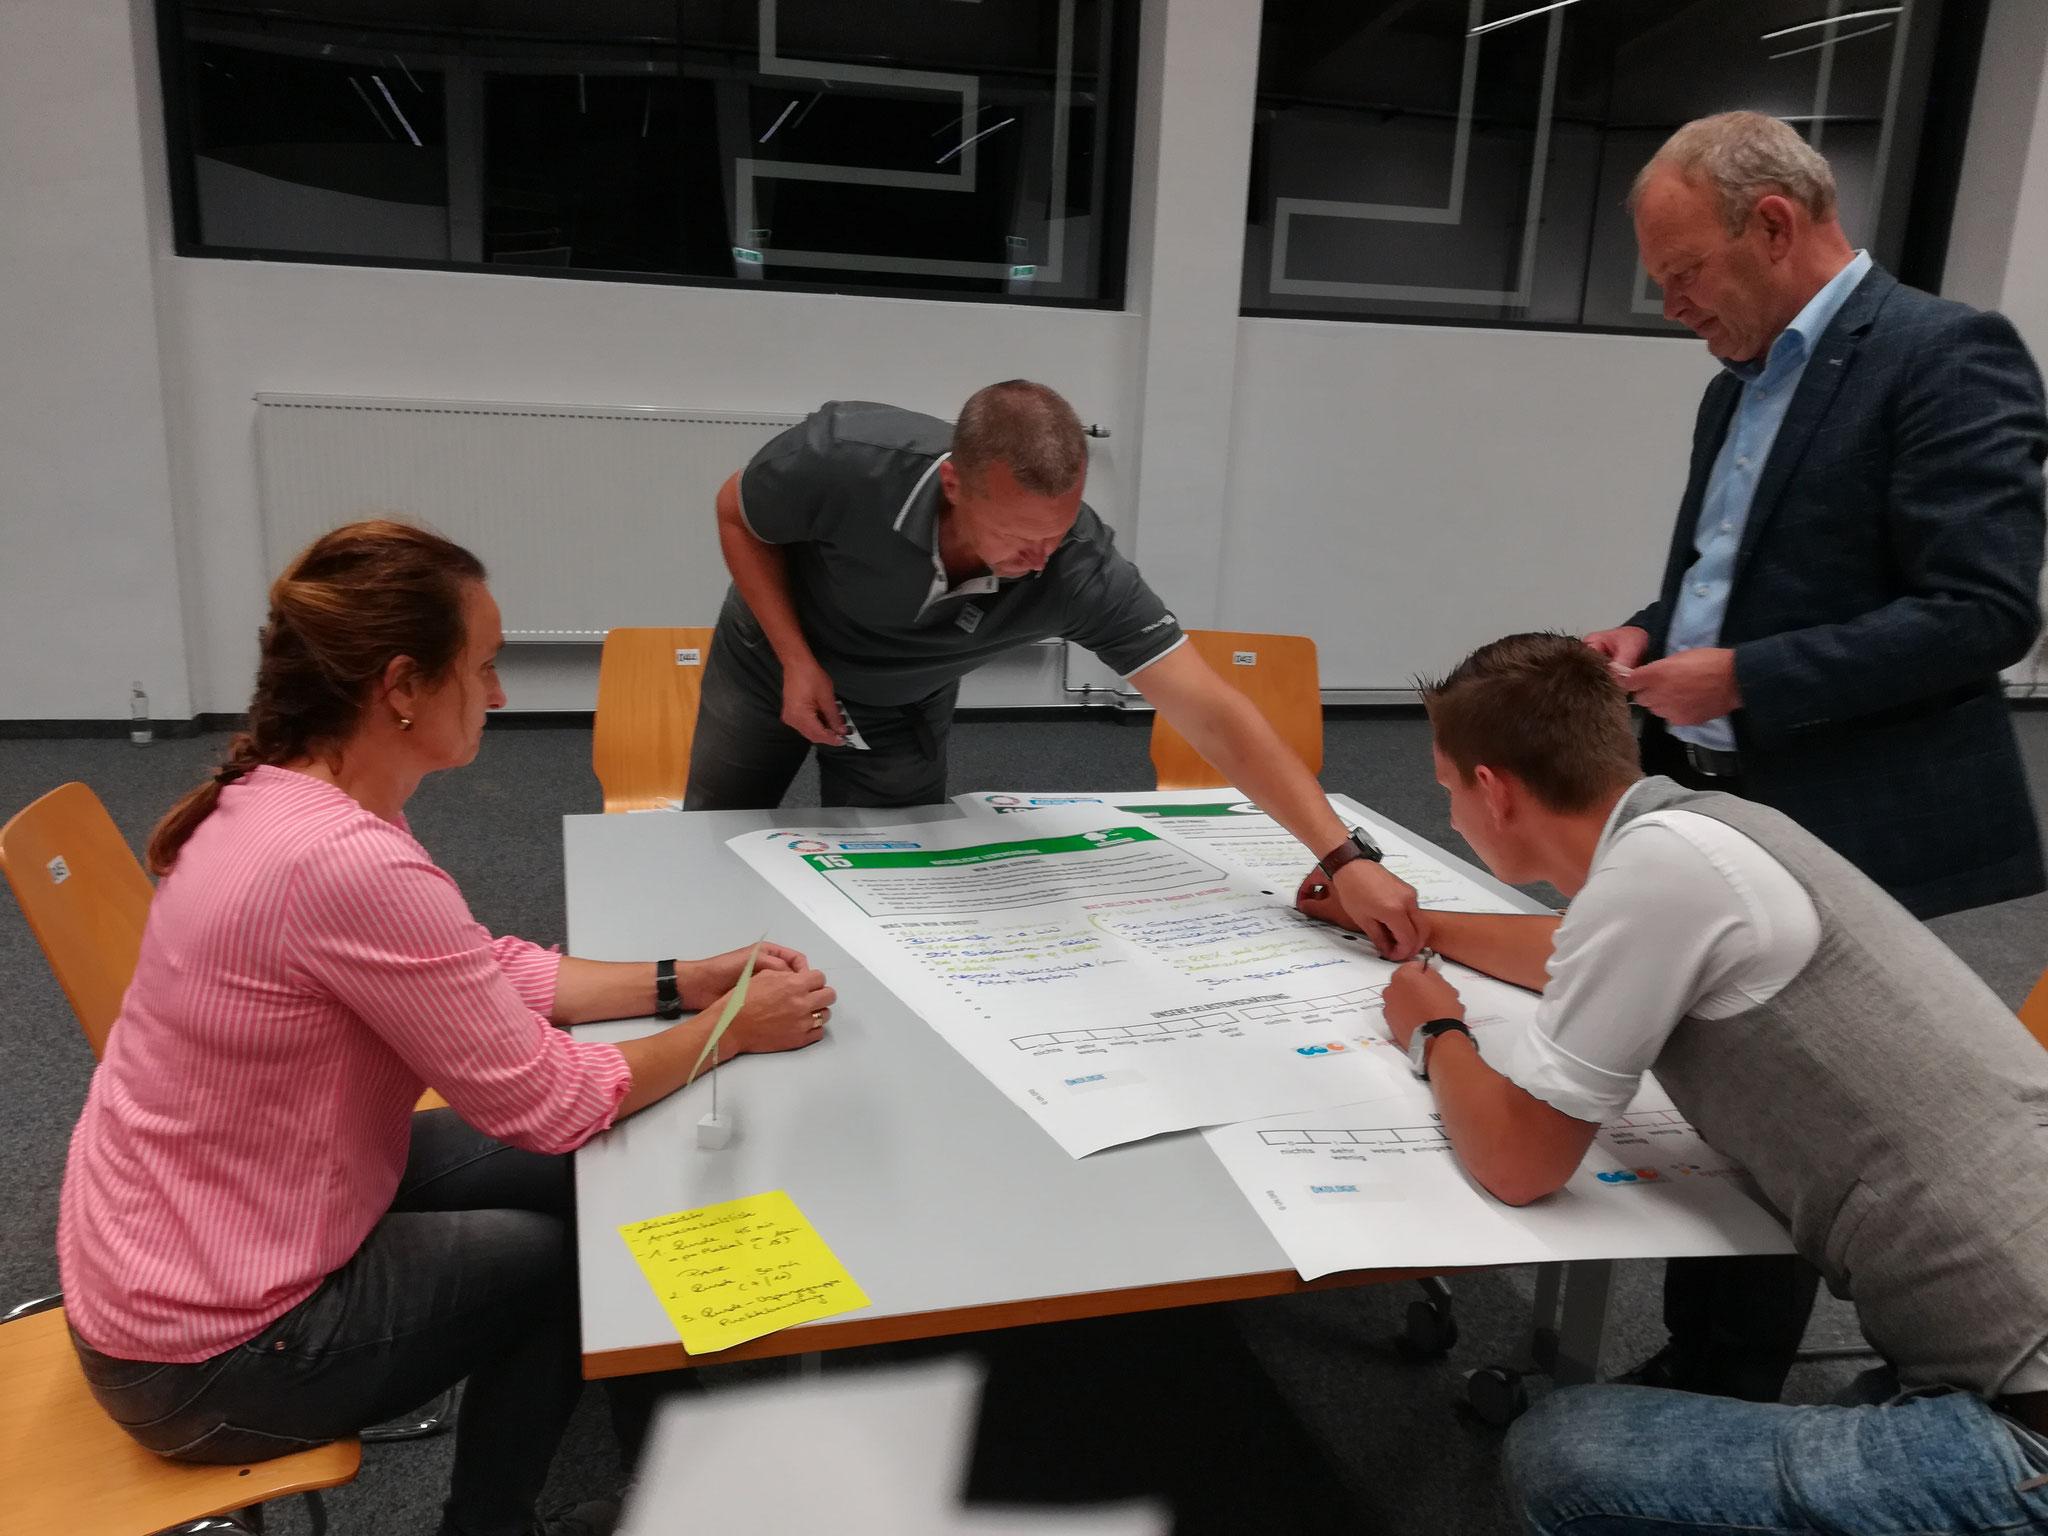 Bürger-Navi Altenmarkt Gruppenarbeit